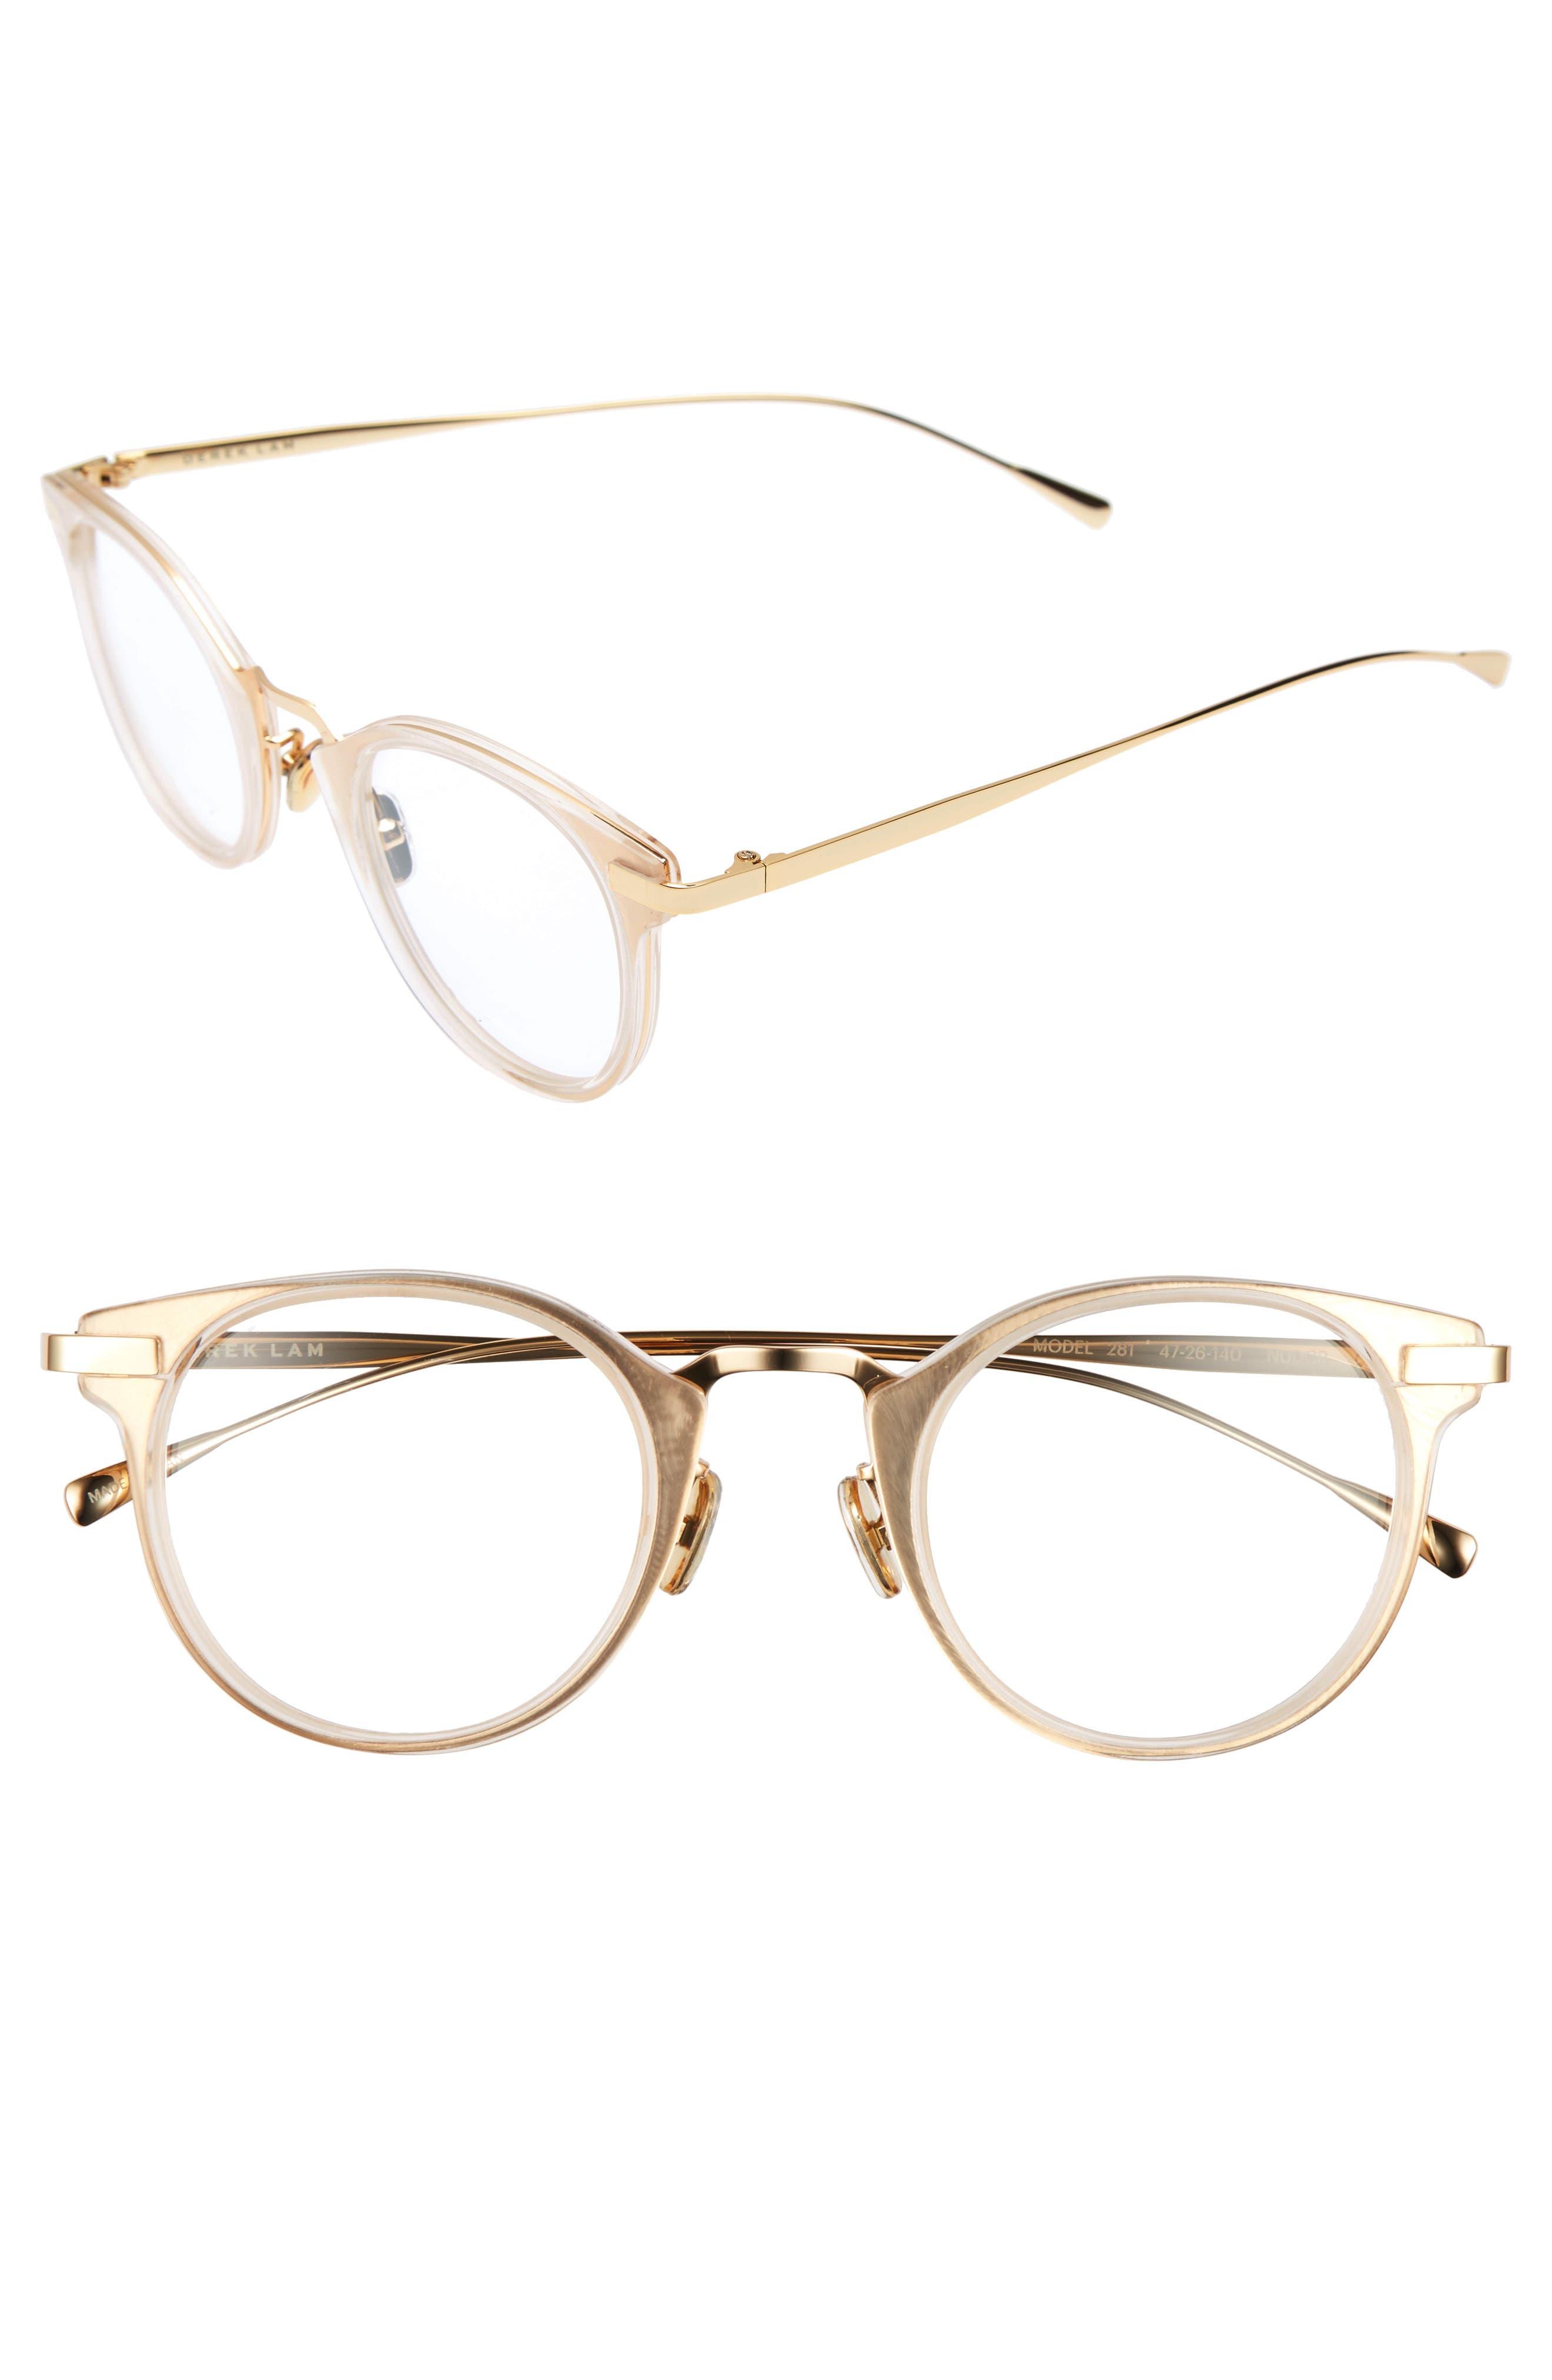 47mm Optical Glasses,                             Main thumbnail 1, color,                             NUDE CRYSTAL